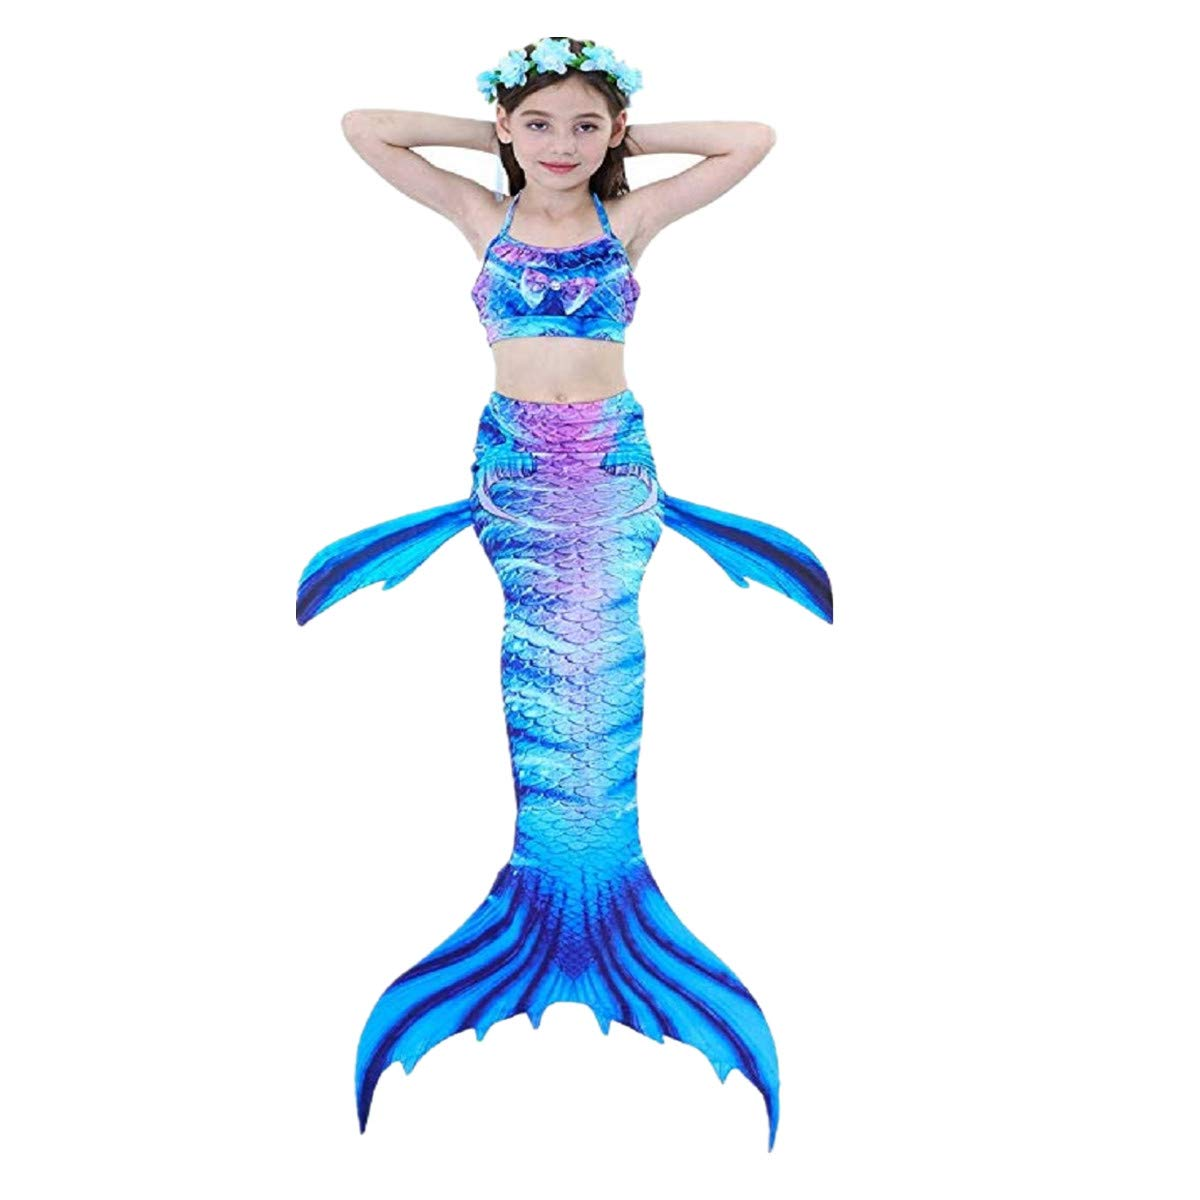 Girls Swimsuit Mermaid Tails for Swimming Princess Bikini Bathing Suit Set (3-12 Years)